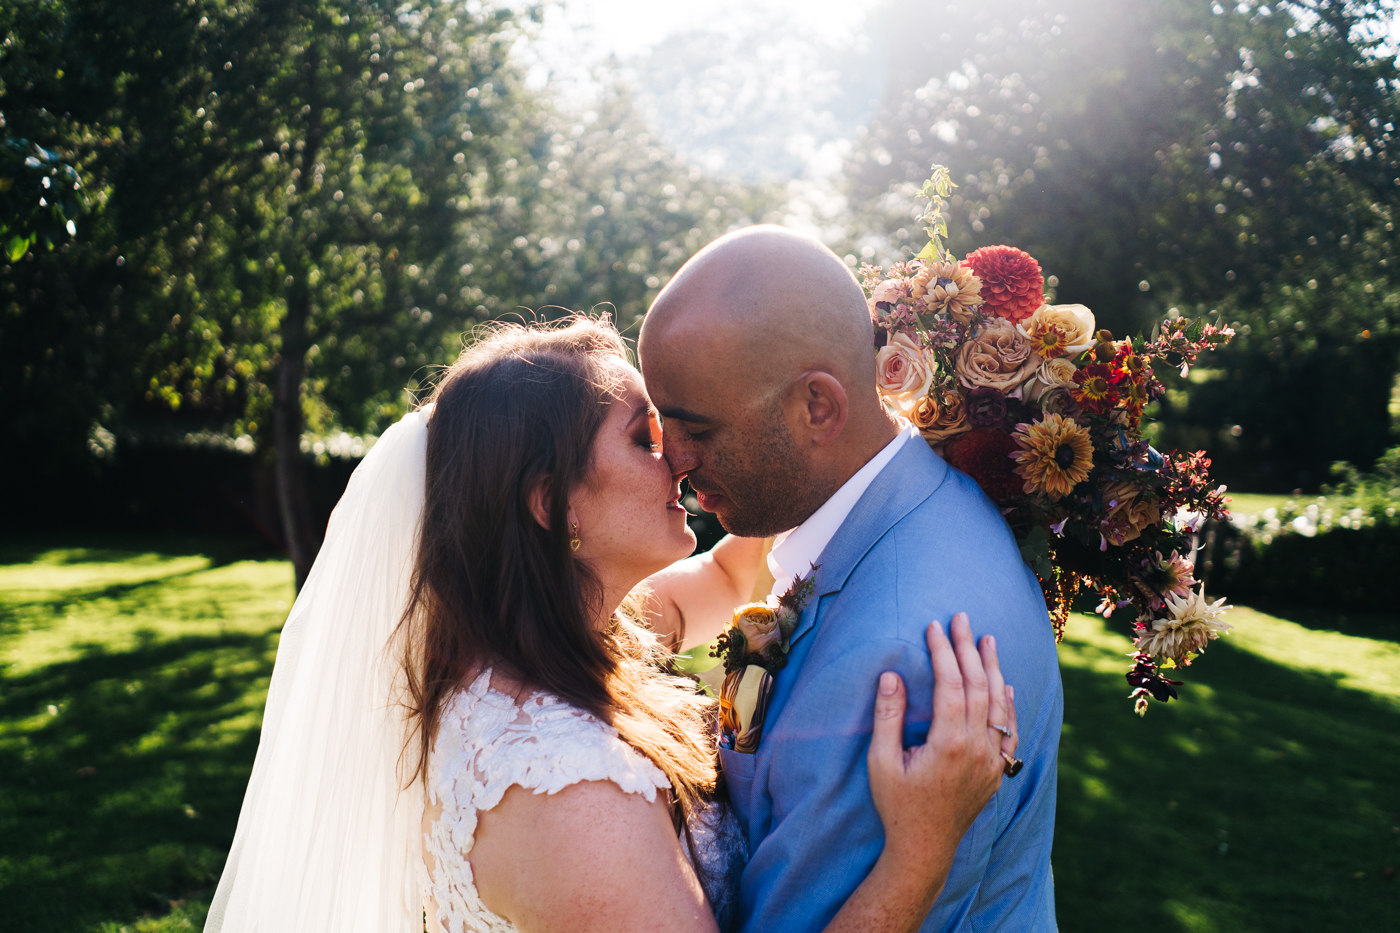 wedding-at-the-pheasant-harome-helmsley-north-yorkshire-wedding-photographer-0036.jpg